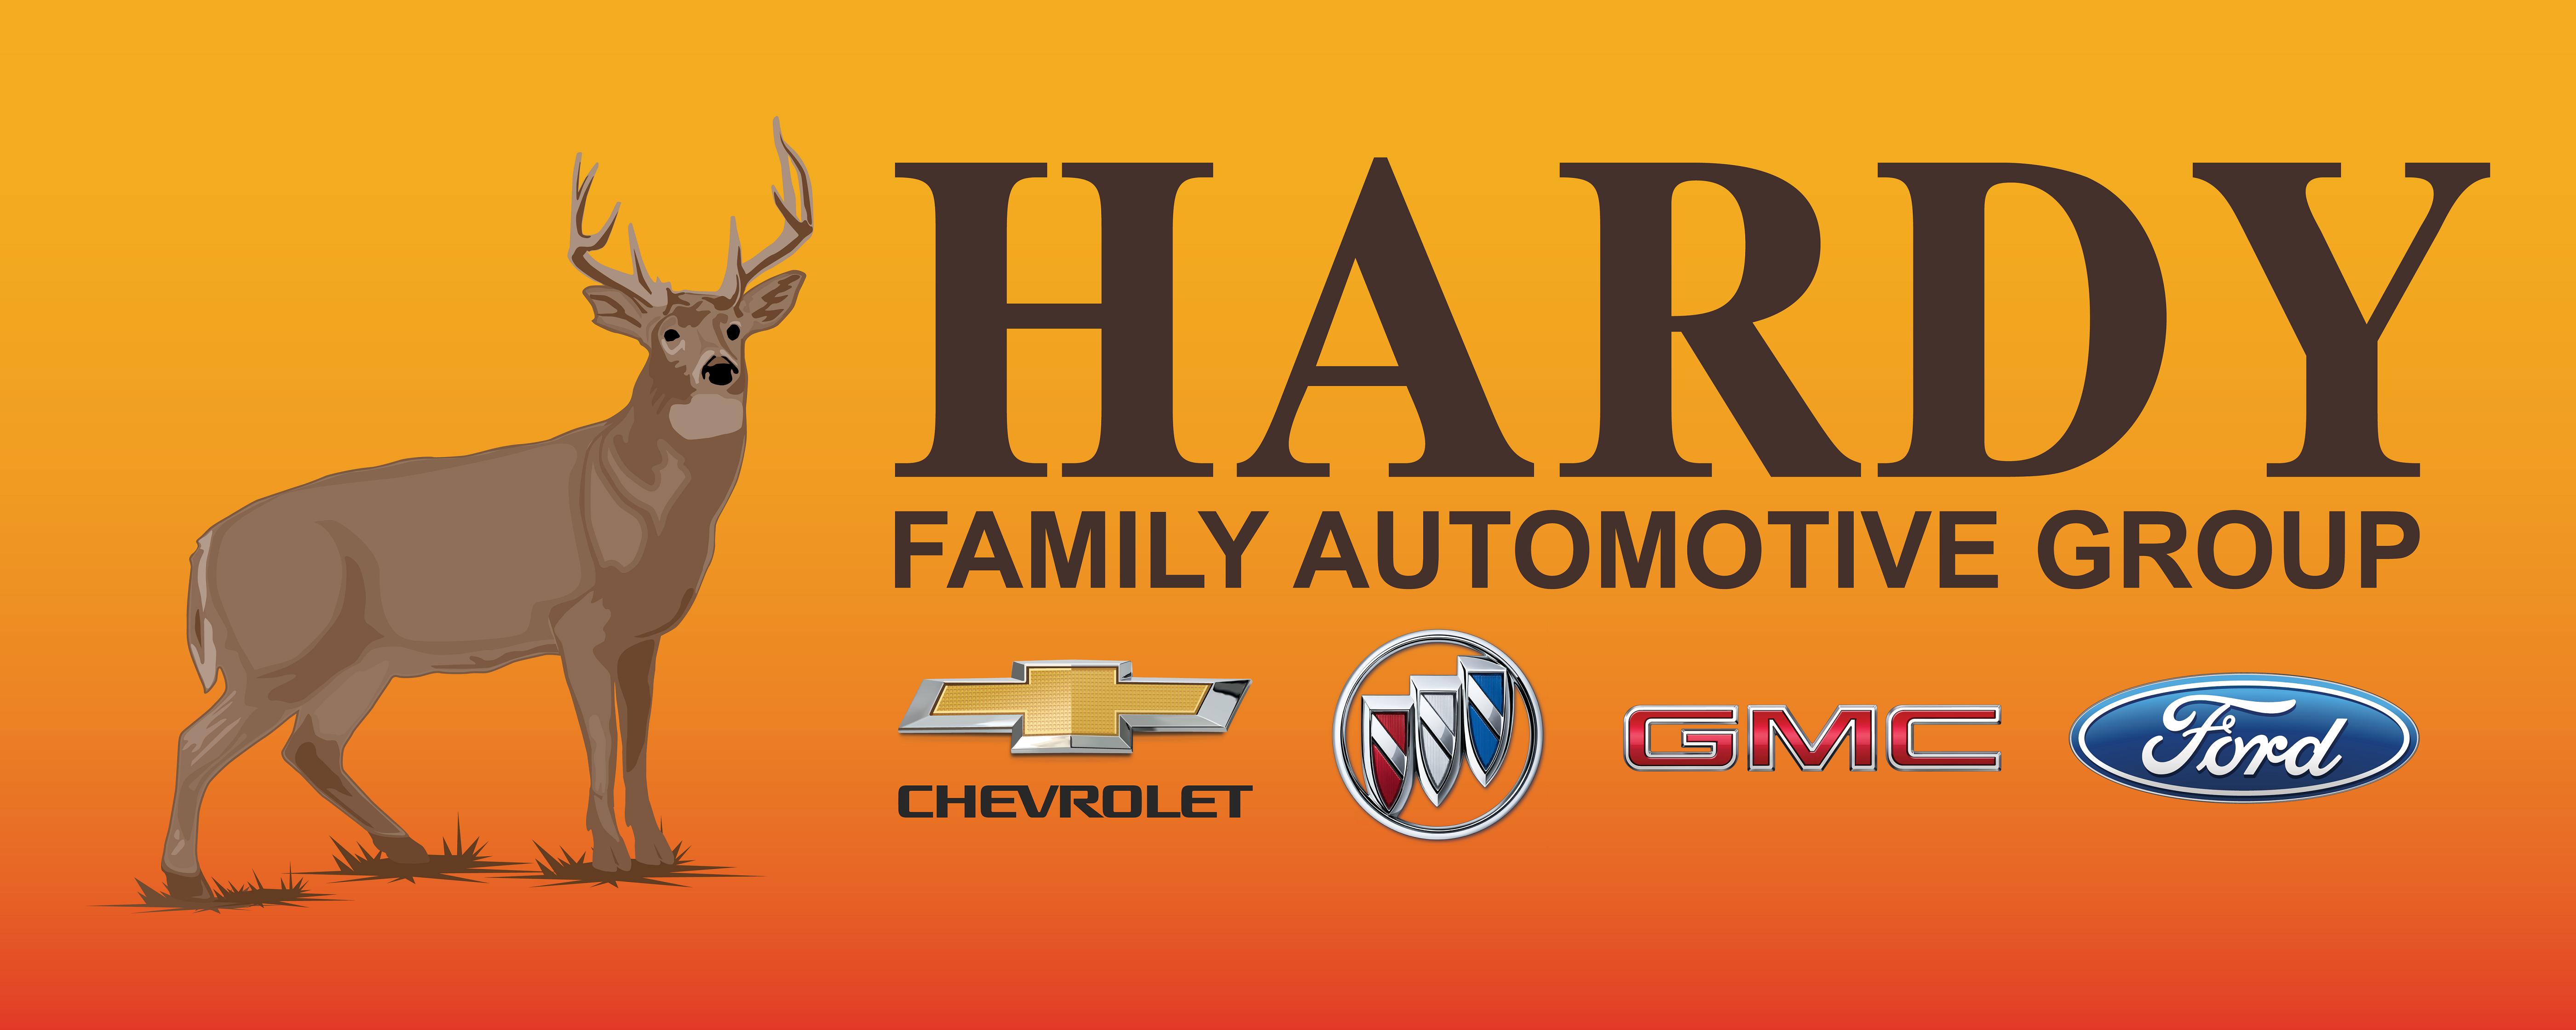 Hardy Family Automotive